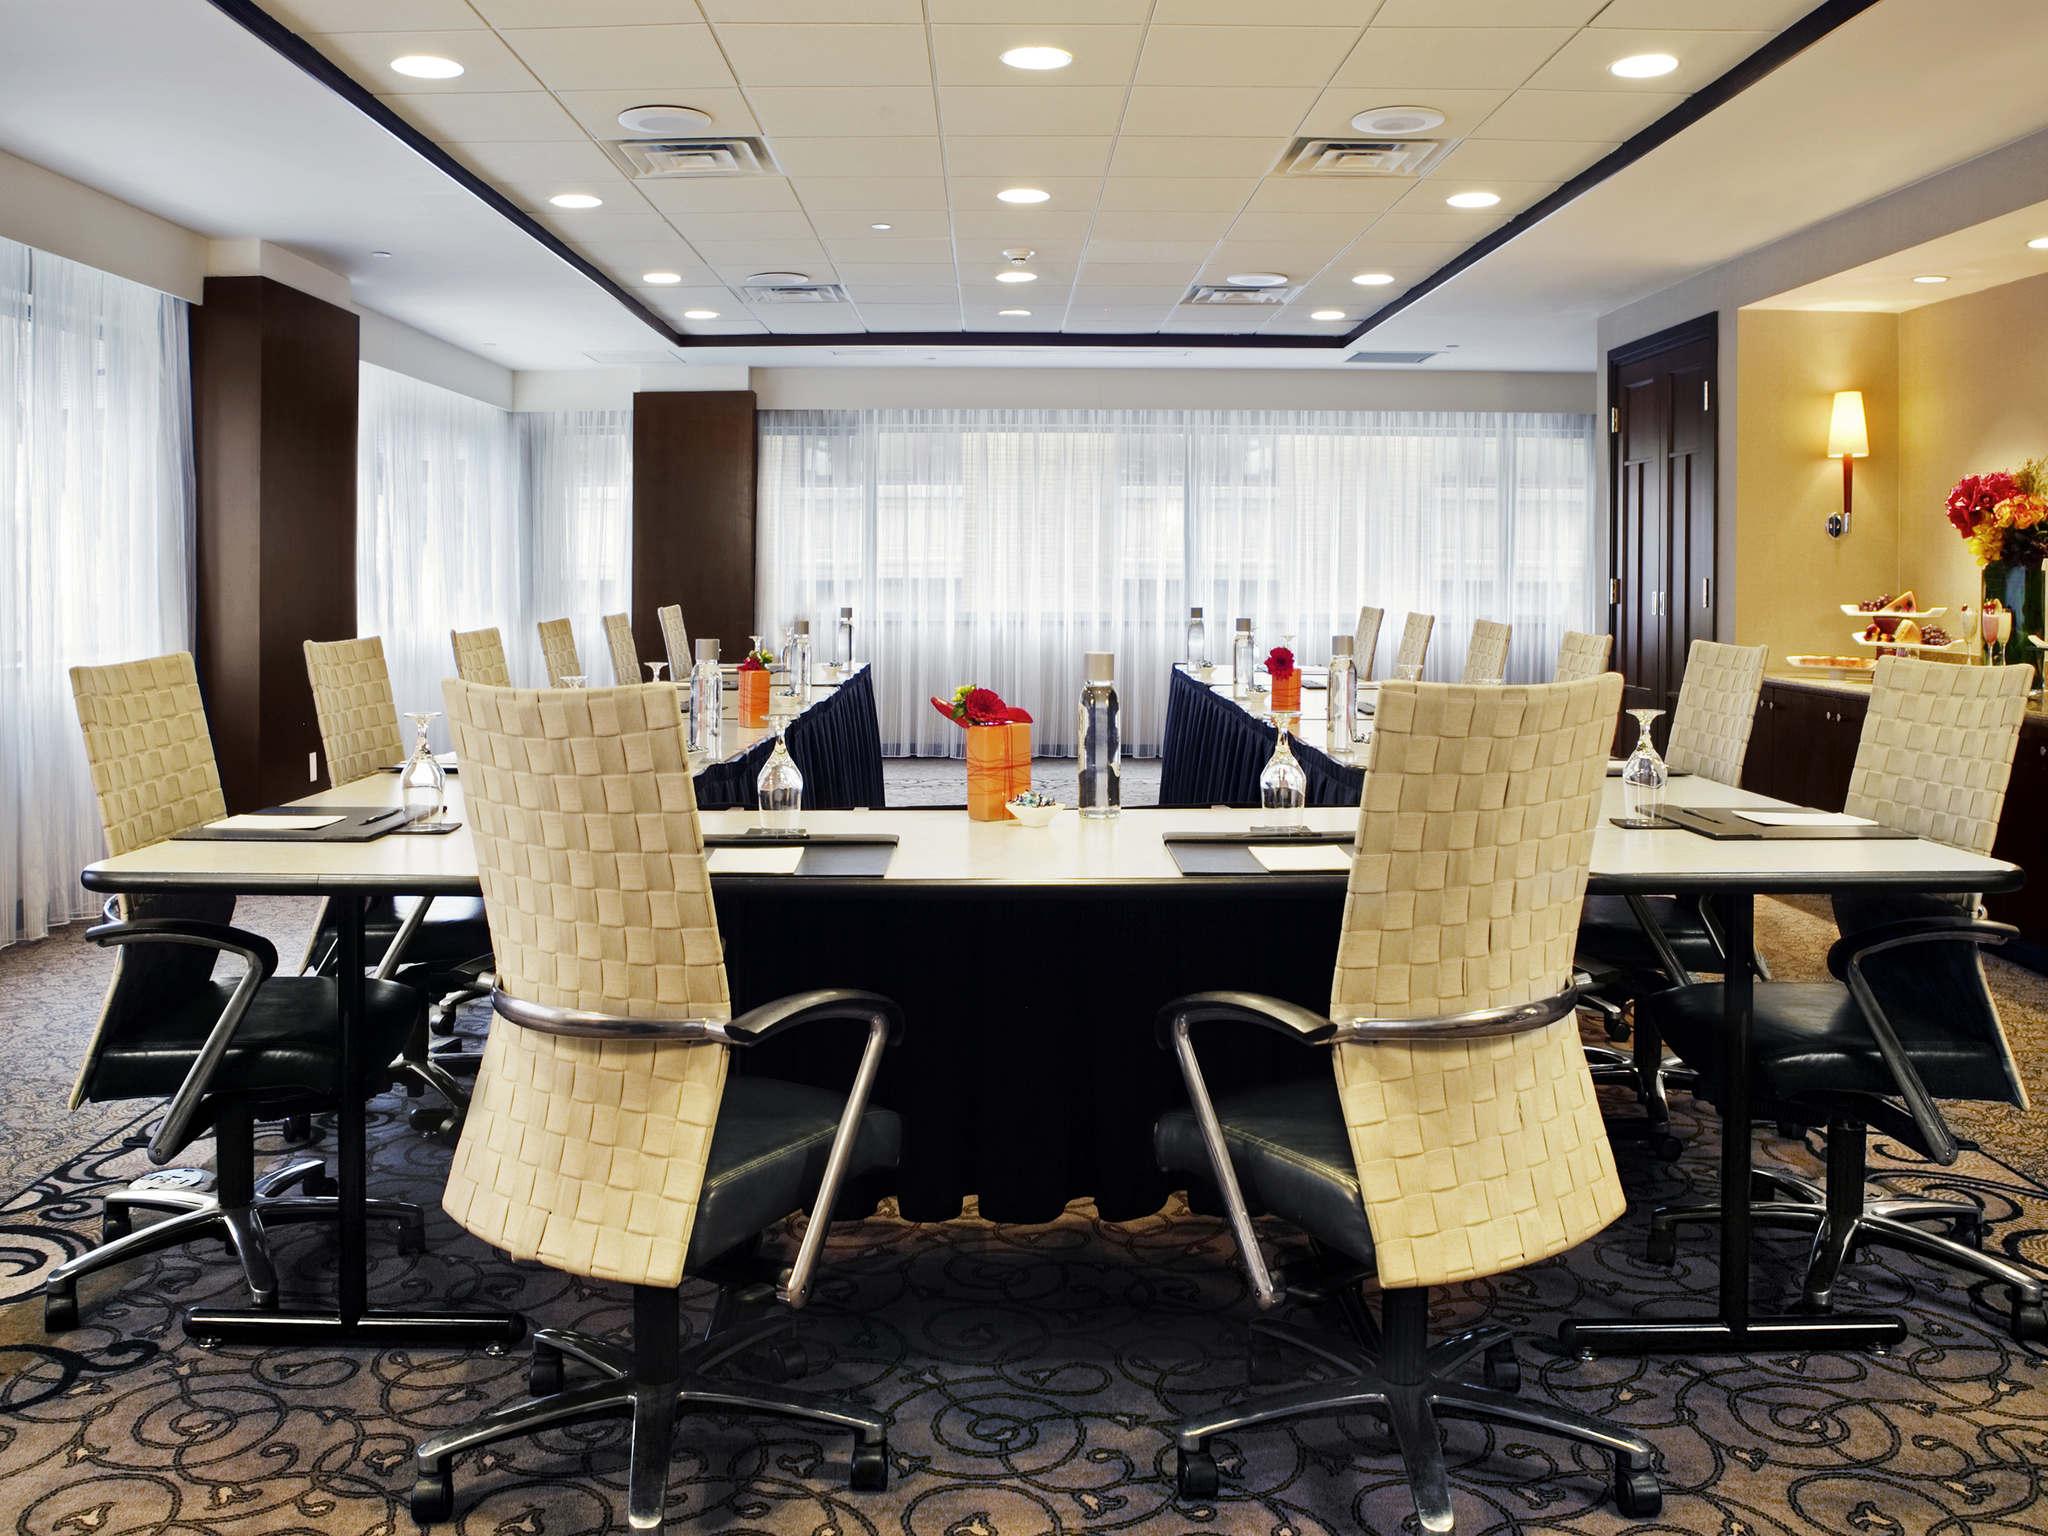 hotel in philadelphia sofitel philadelphia meetings and events sofitel philadelphia